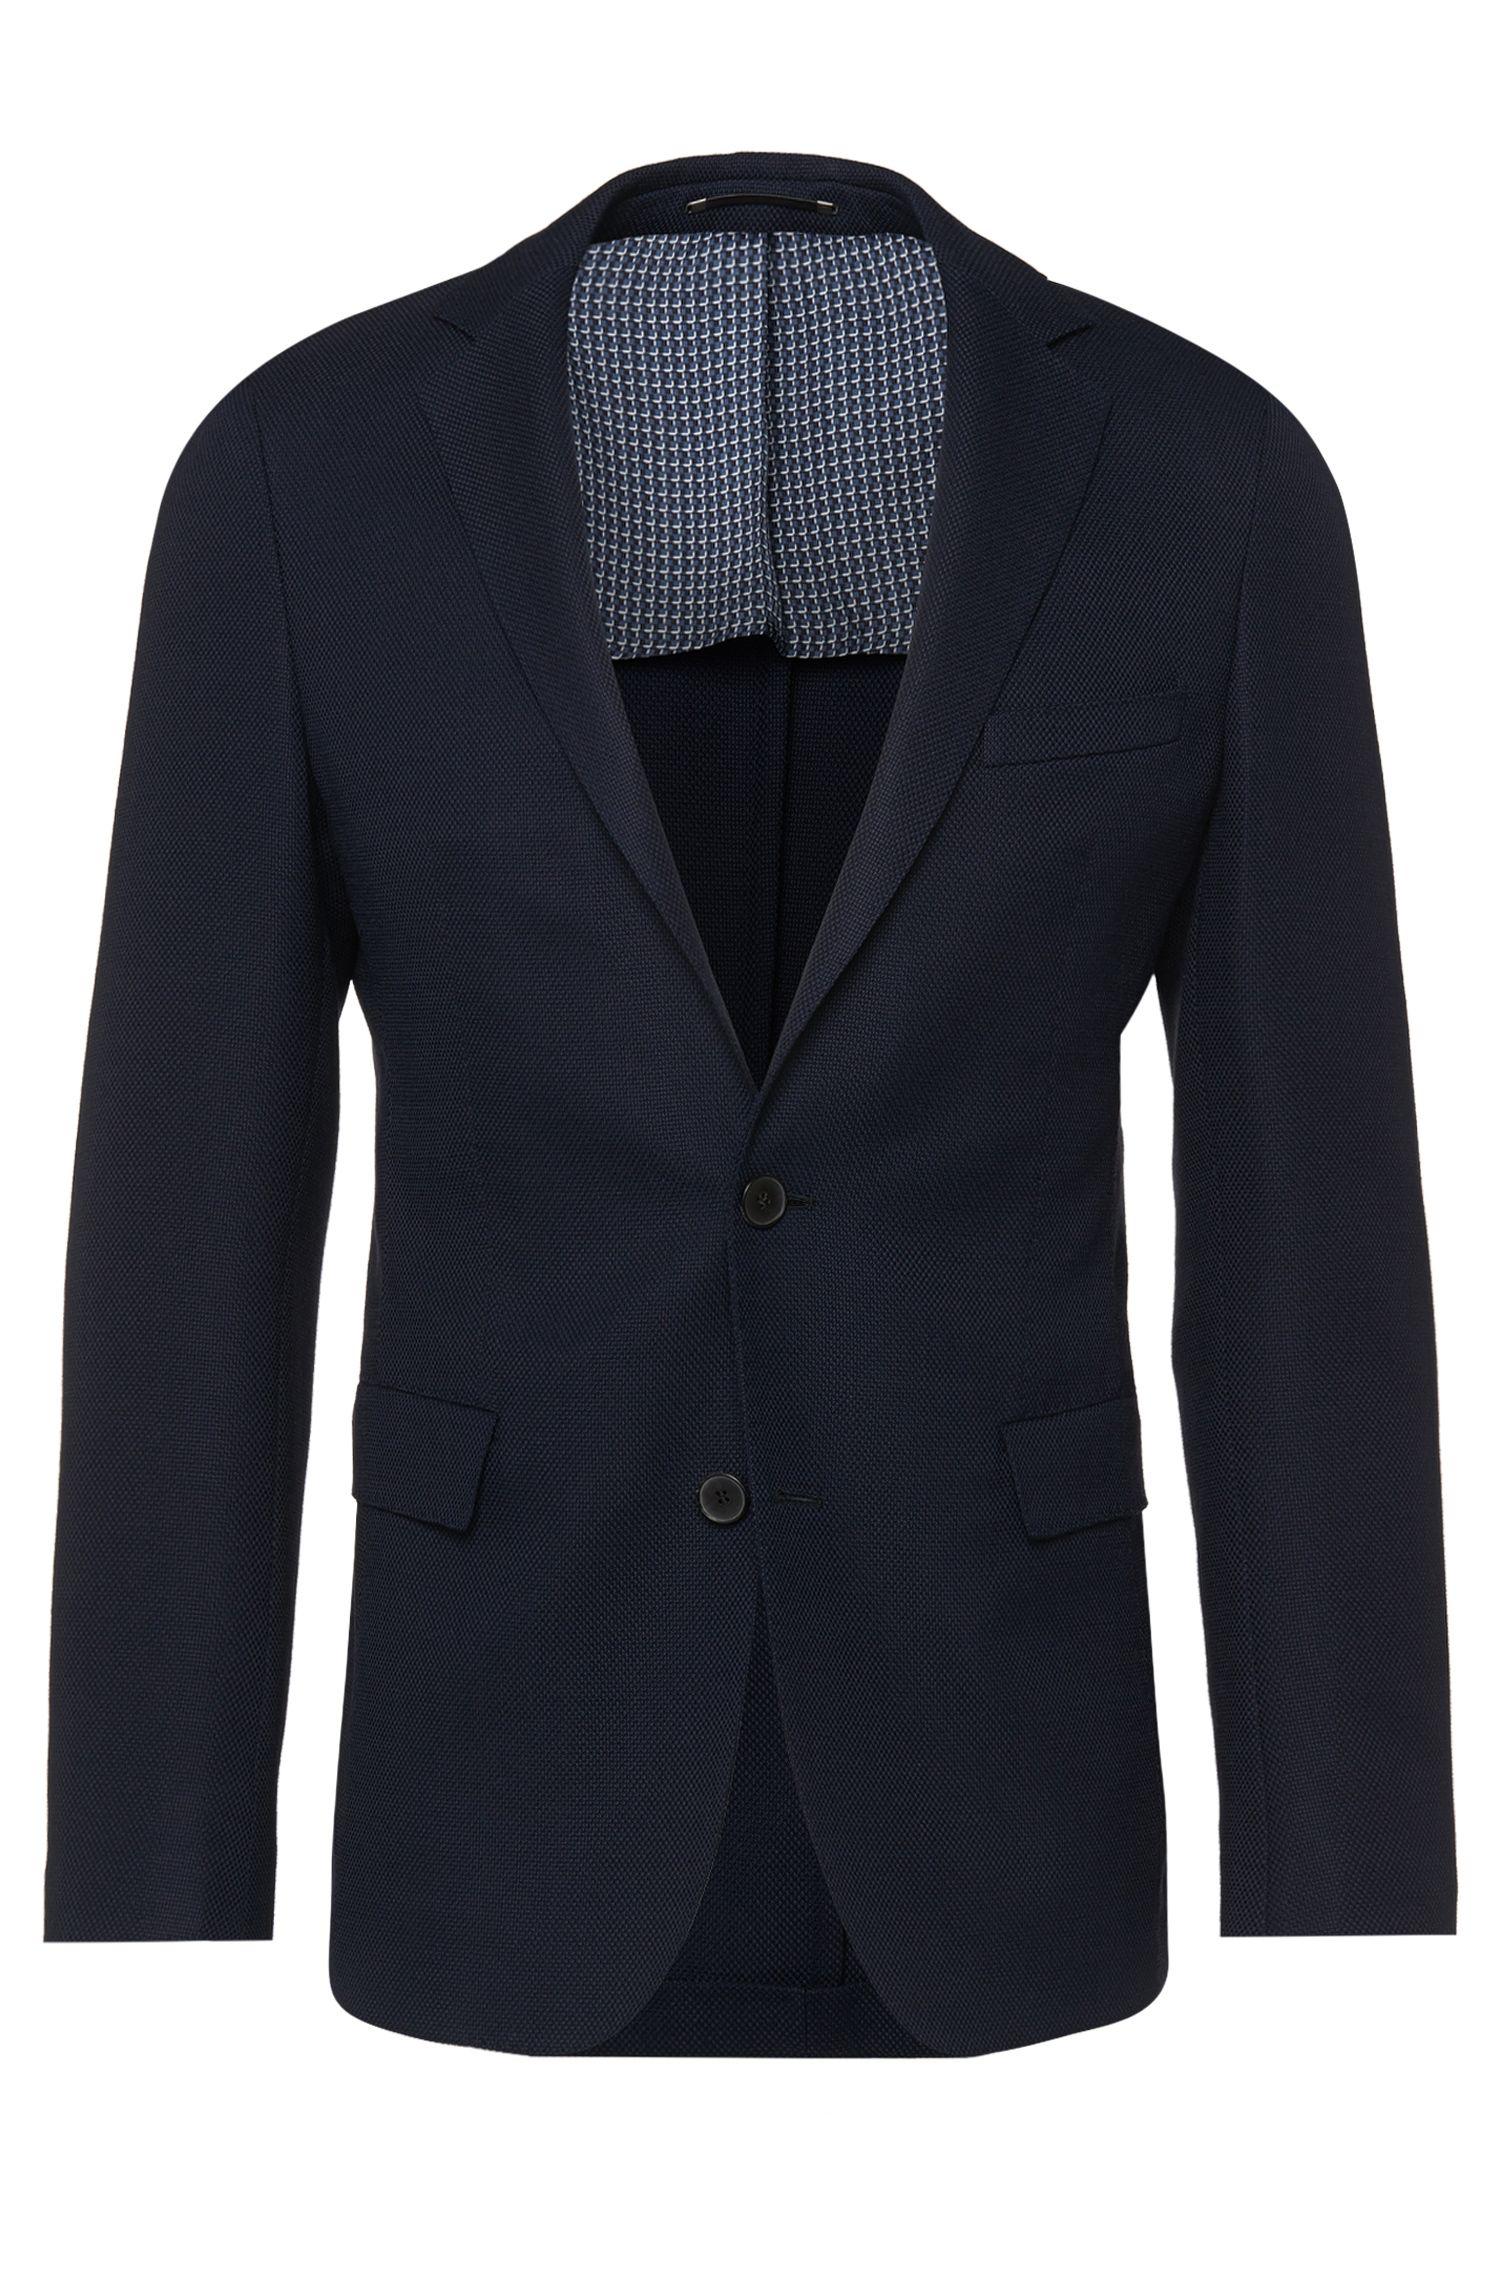 'Roan' | Extra Slim Fit, Italian Stretch Virgin Wool Textured Sport Coat